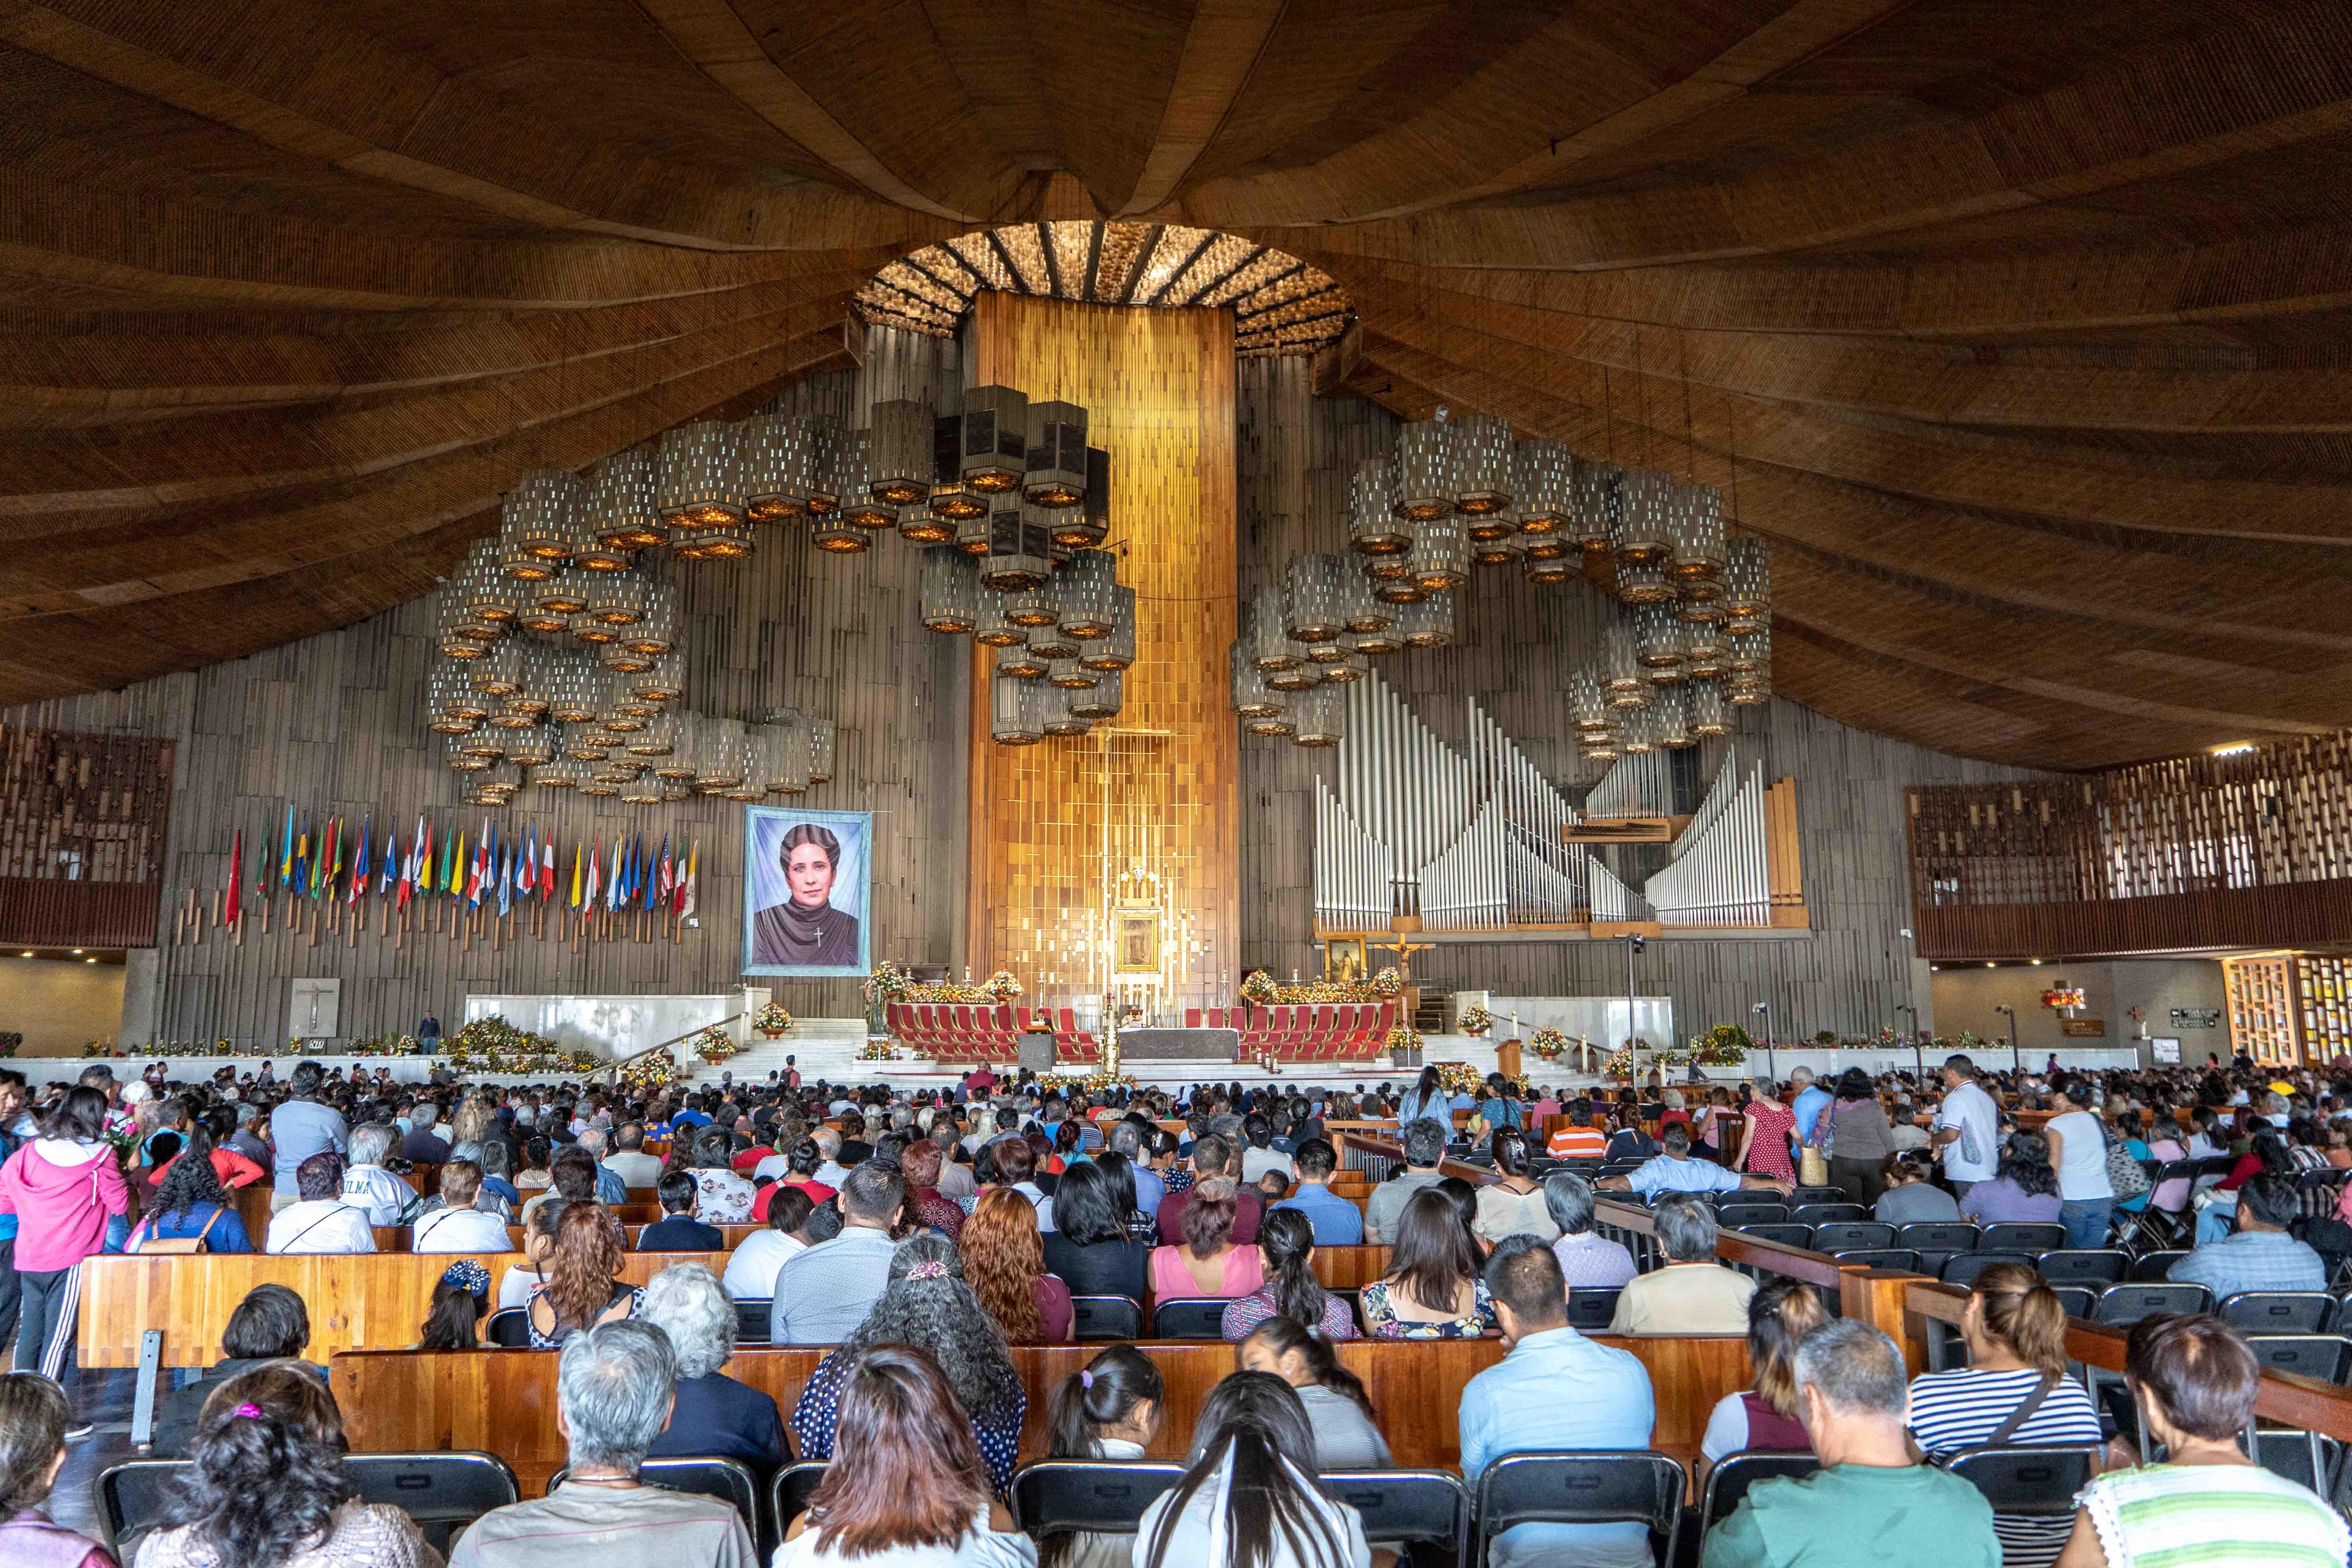 La Basilica Nuestra Senora de Guadalupe peut accueillir 40 000 fidèles.